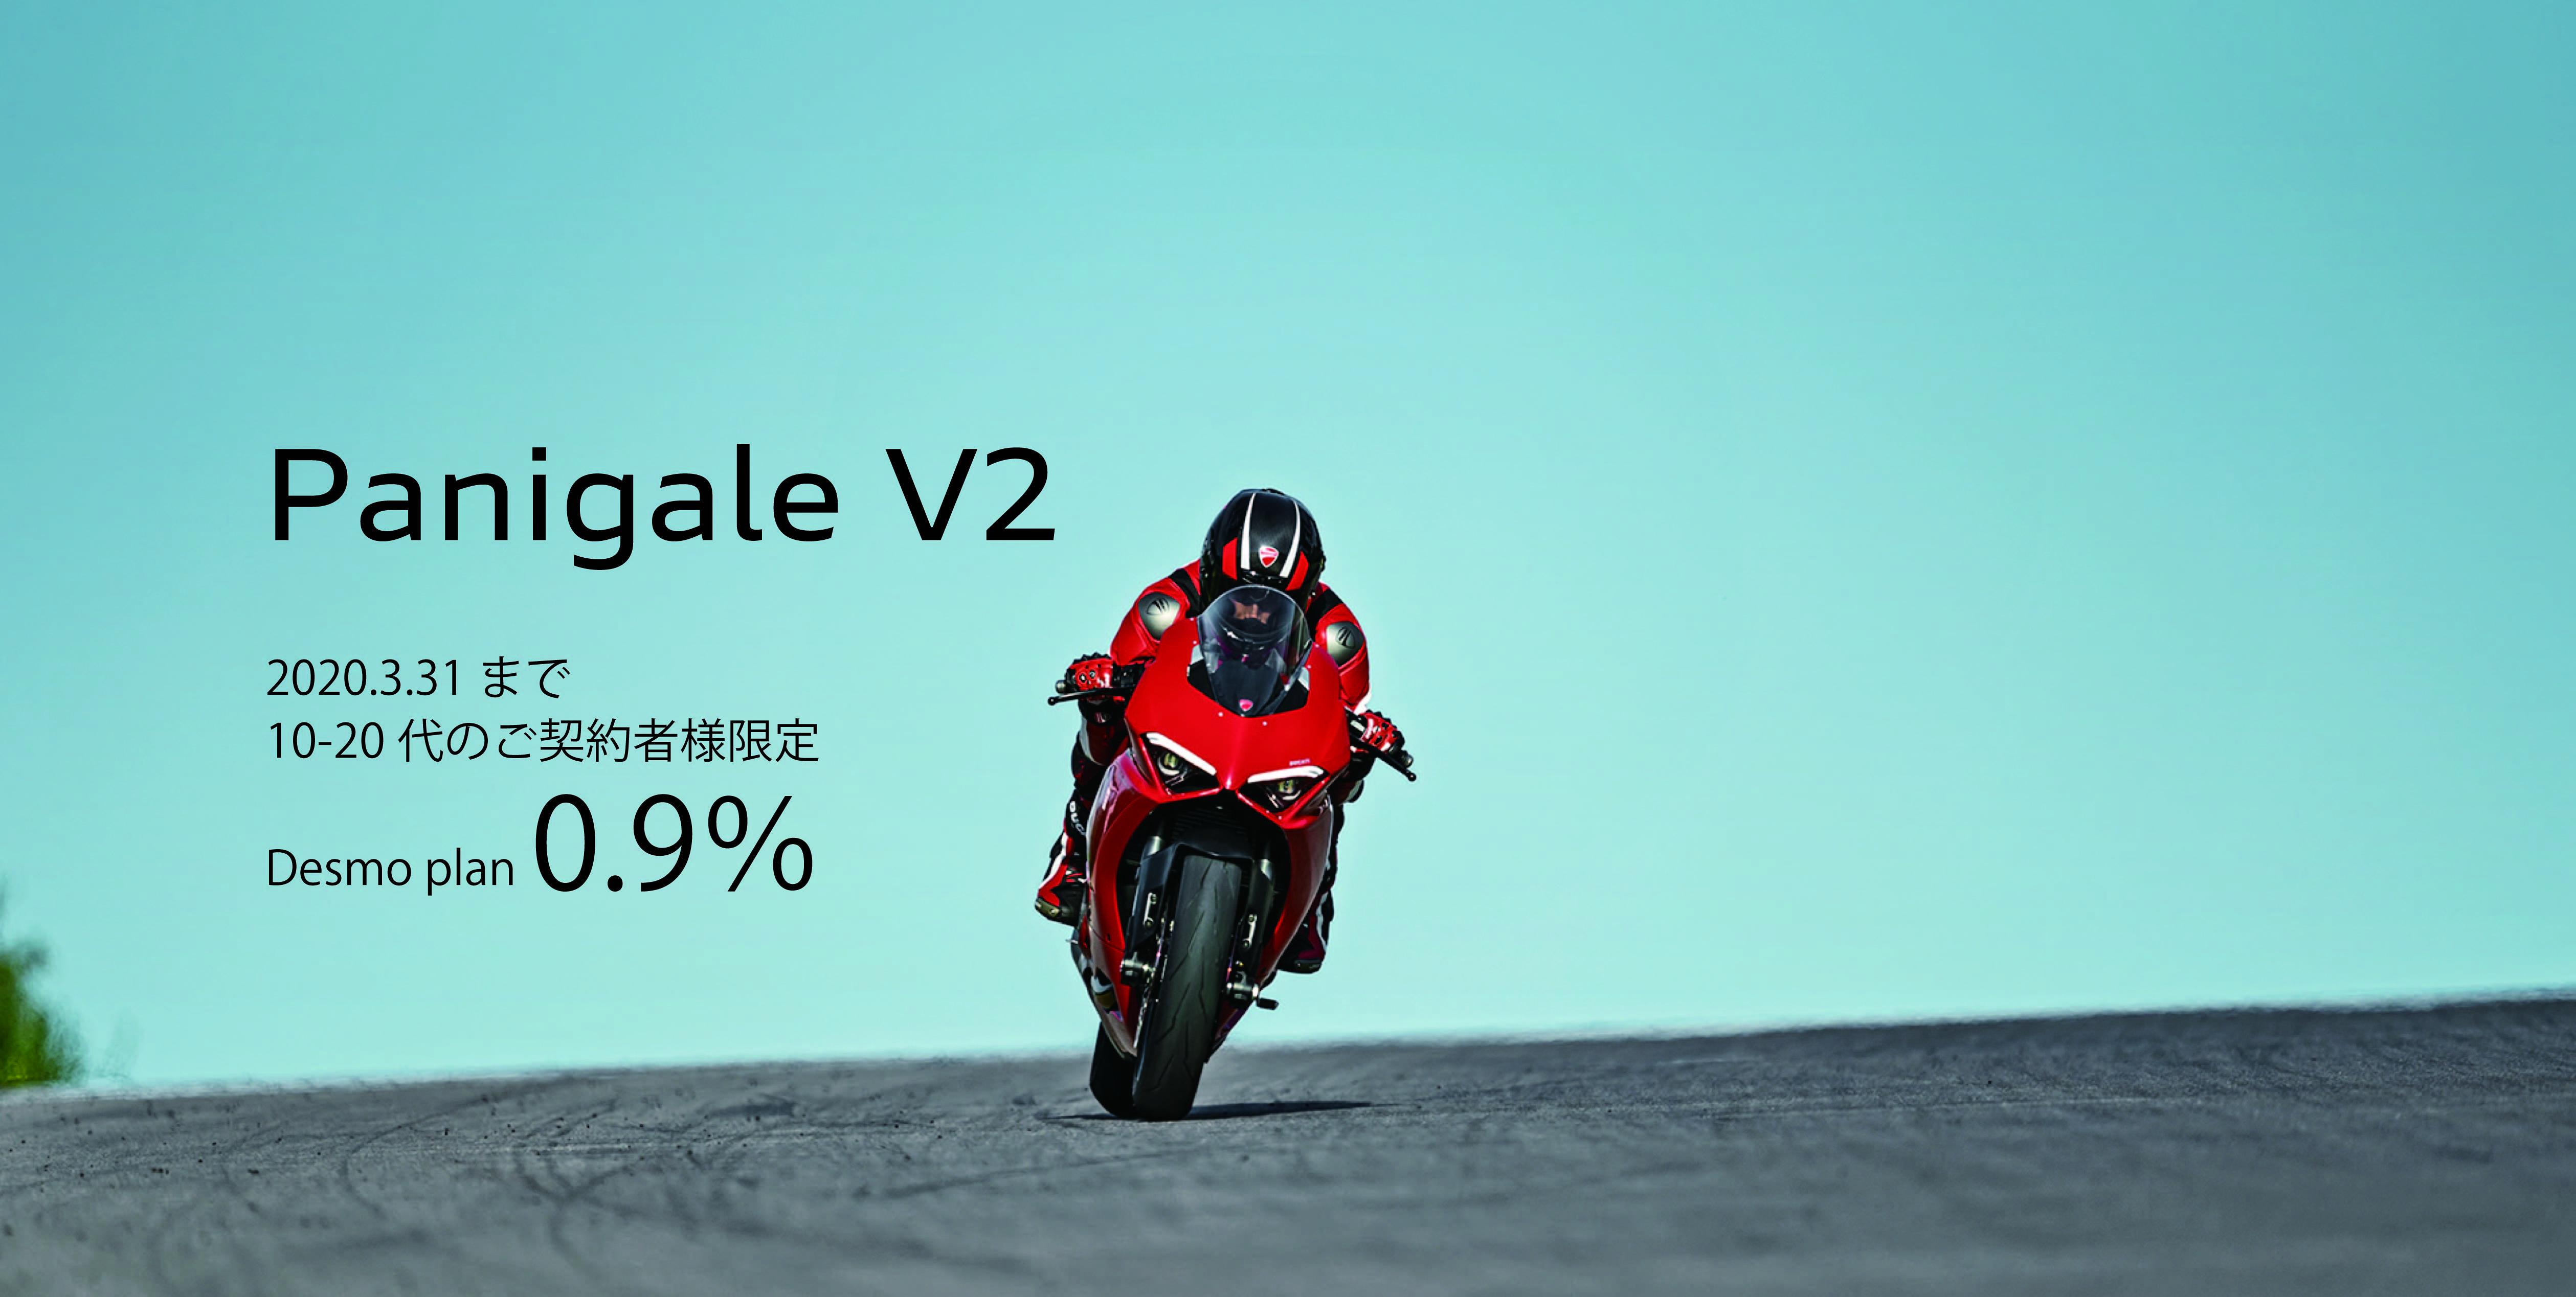 Panigale V2 2020.3.31まで10-20代のご契約者様限定 Desmo plan0.9%